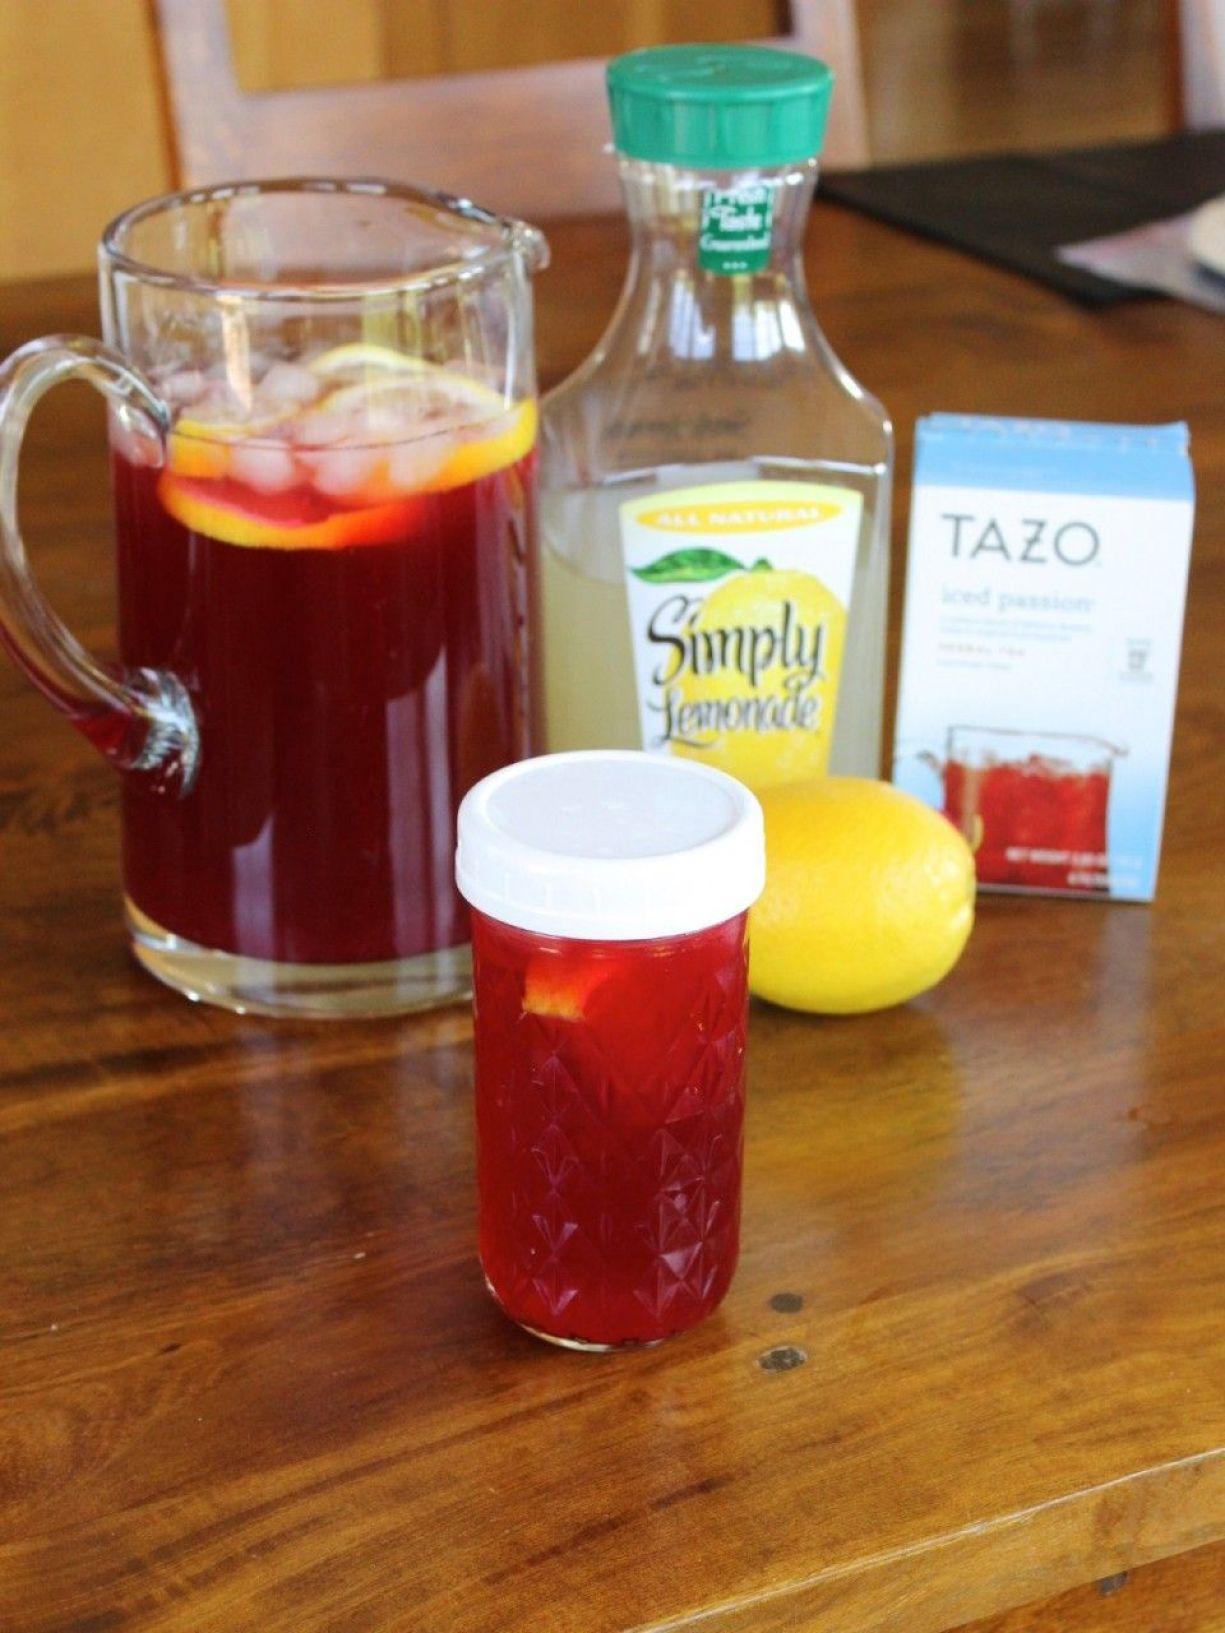 Taza Iced Passion tea and lemonade.